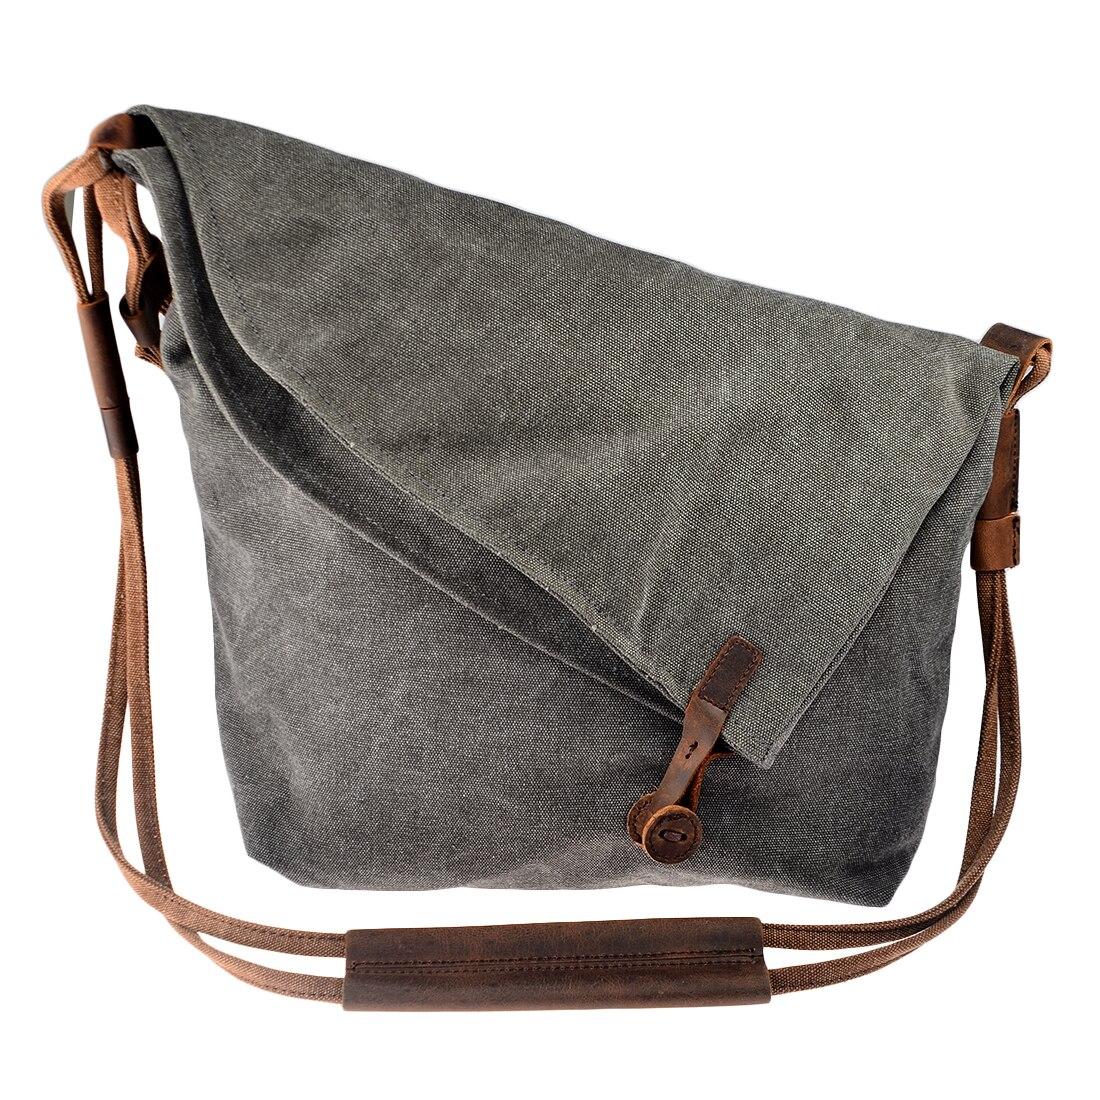 sacolas bolsa shouder senhoras bolsa Formato : Women's Shouder Bag